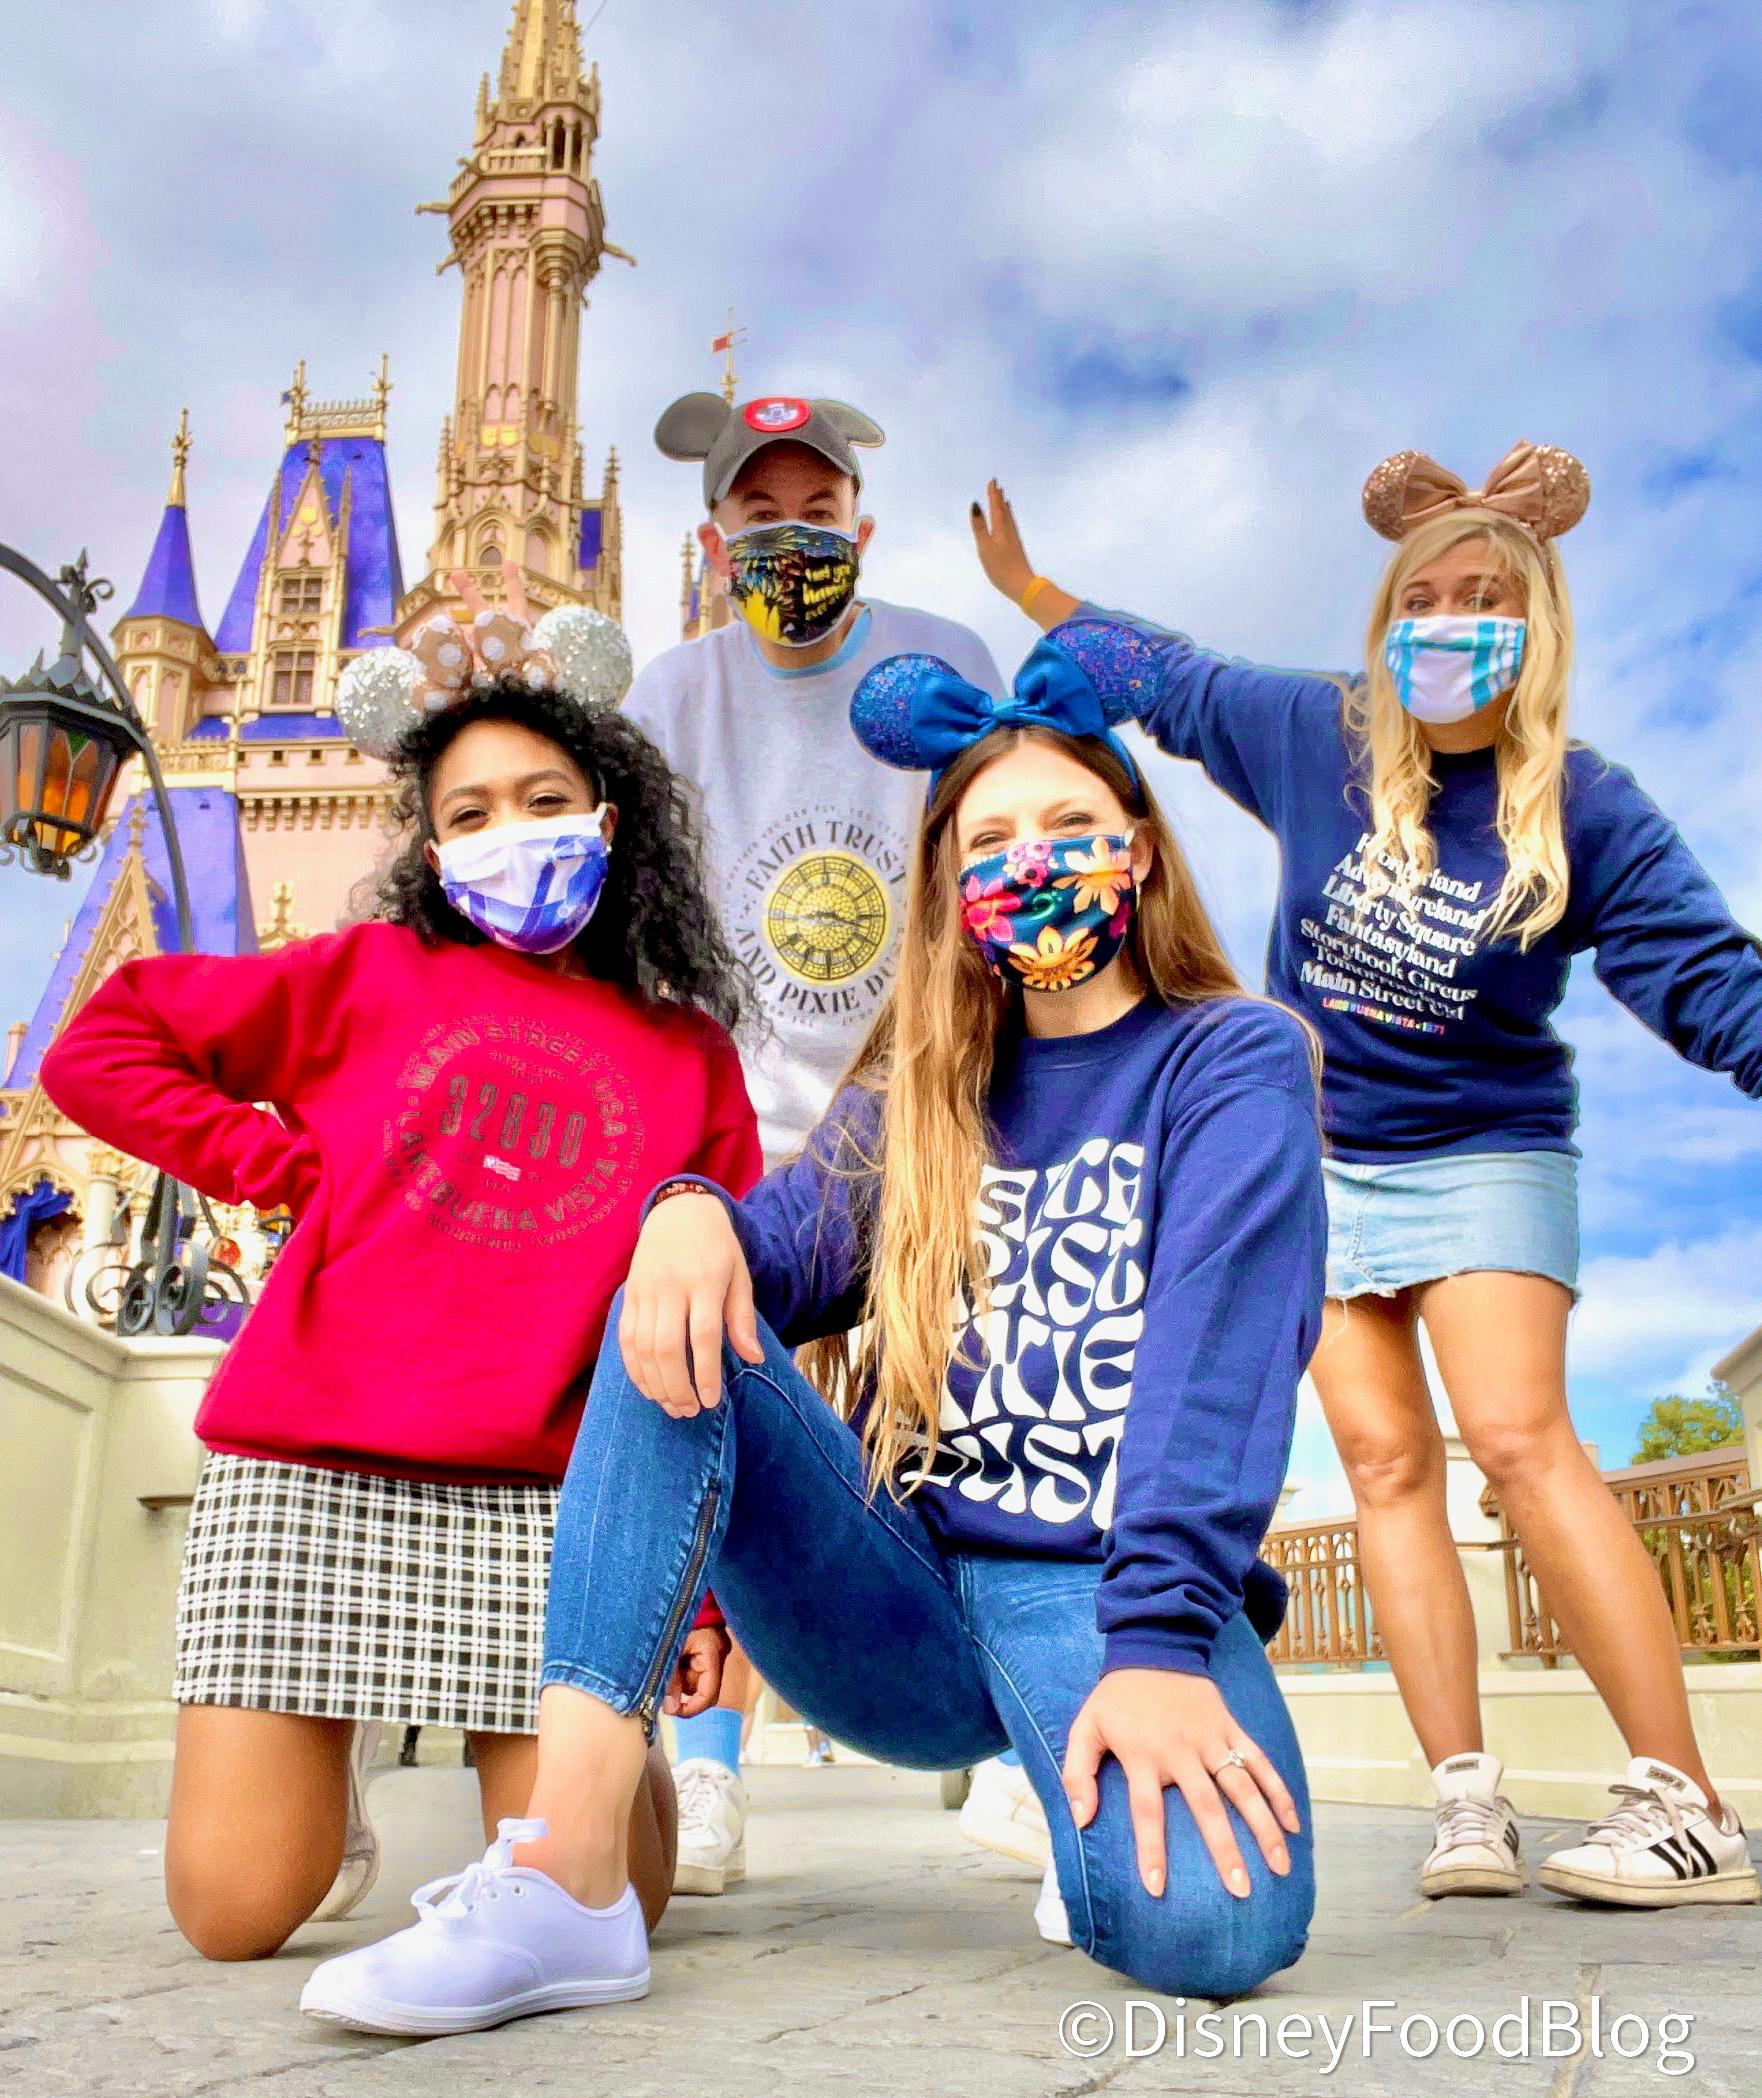 dfb-merch-sweatshirts-masks